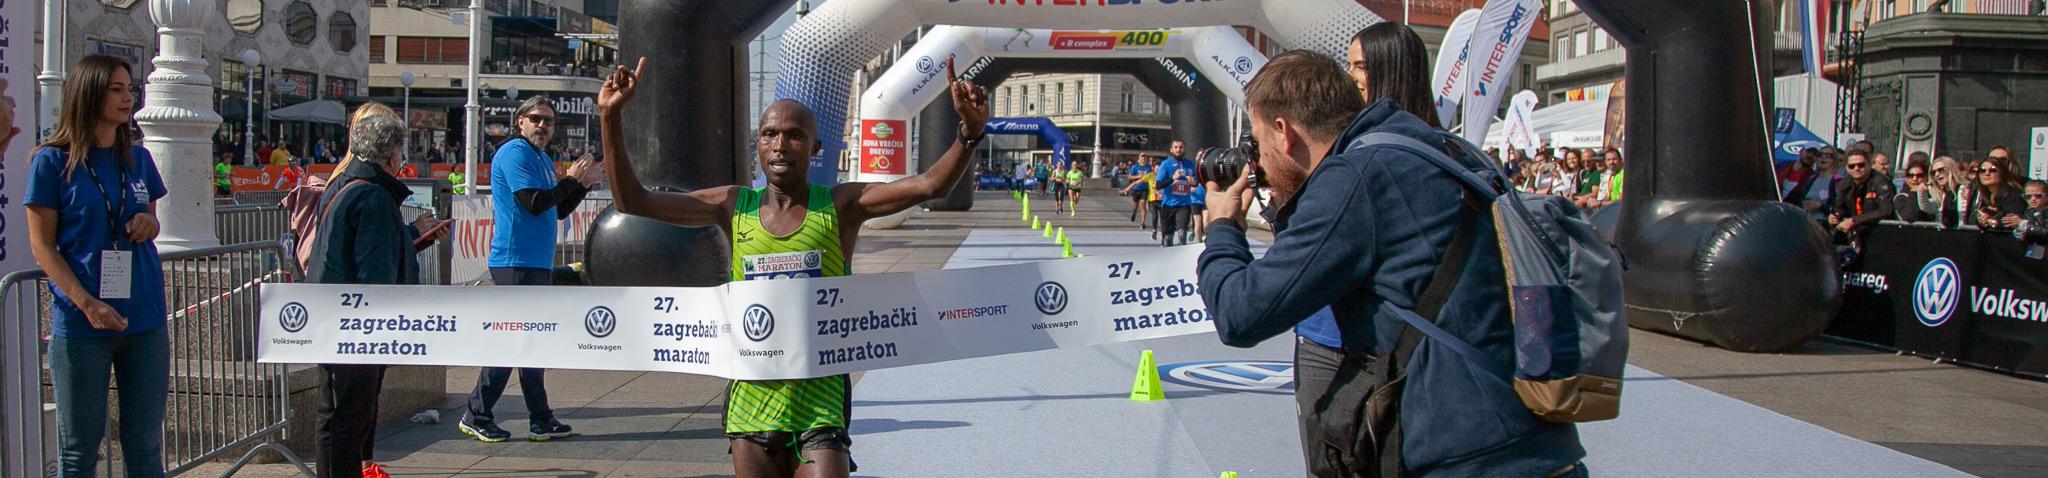 https://www.zagreb-marathon.com/wp-content/uploads/maraton08.jpg